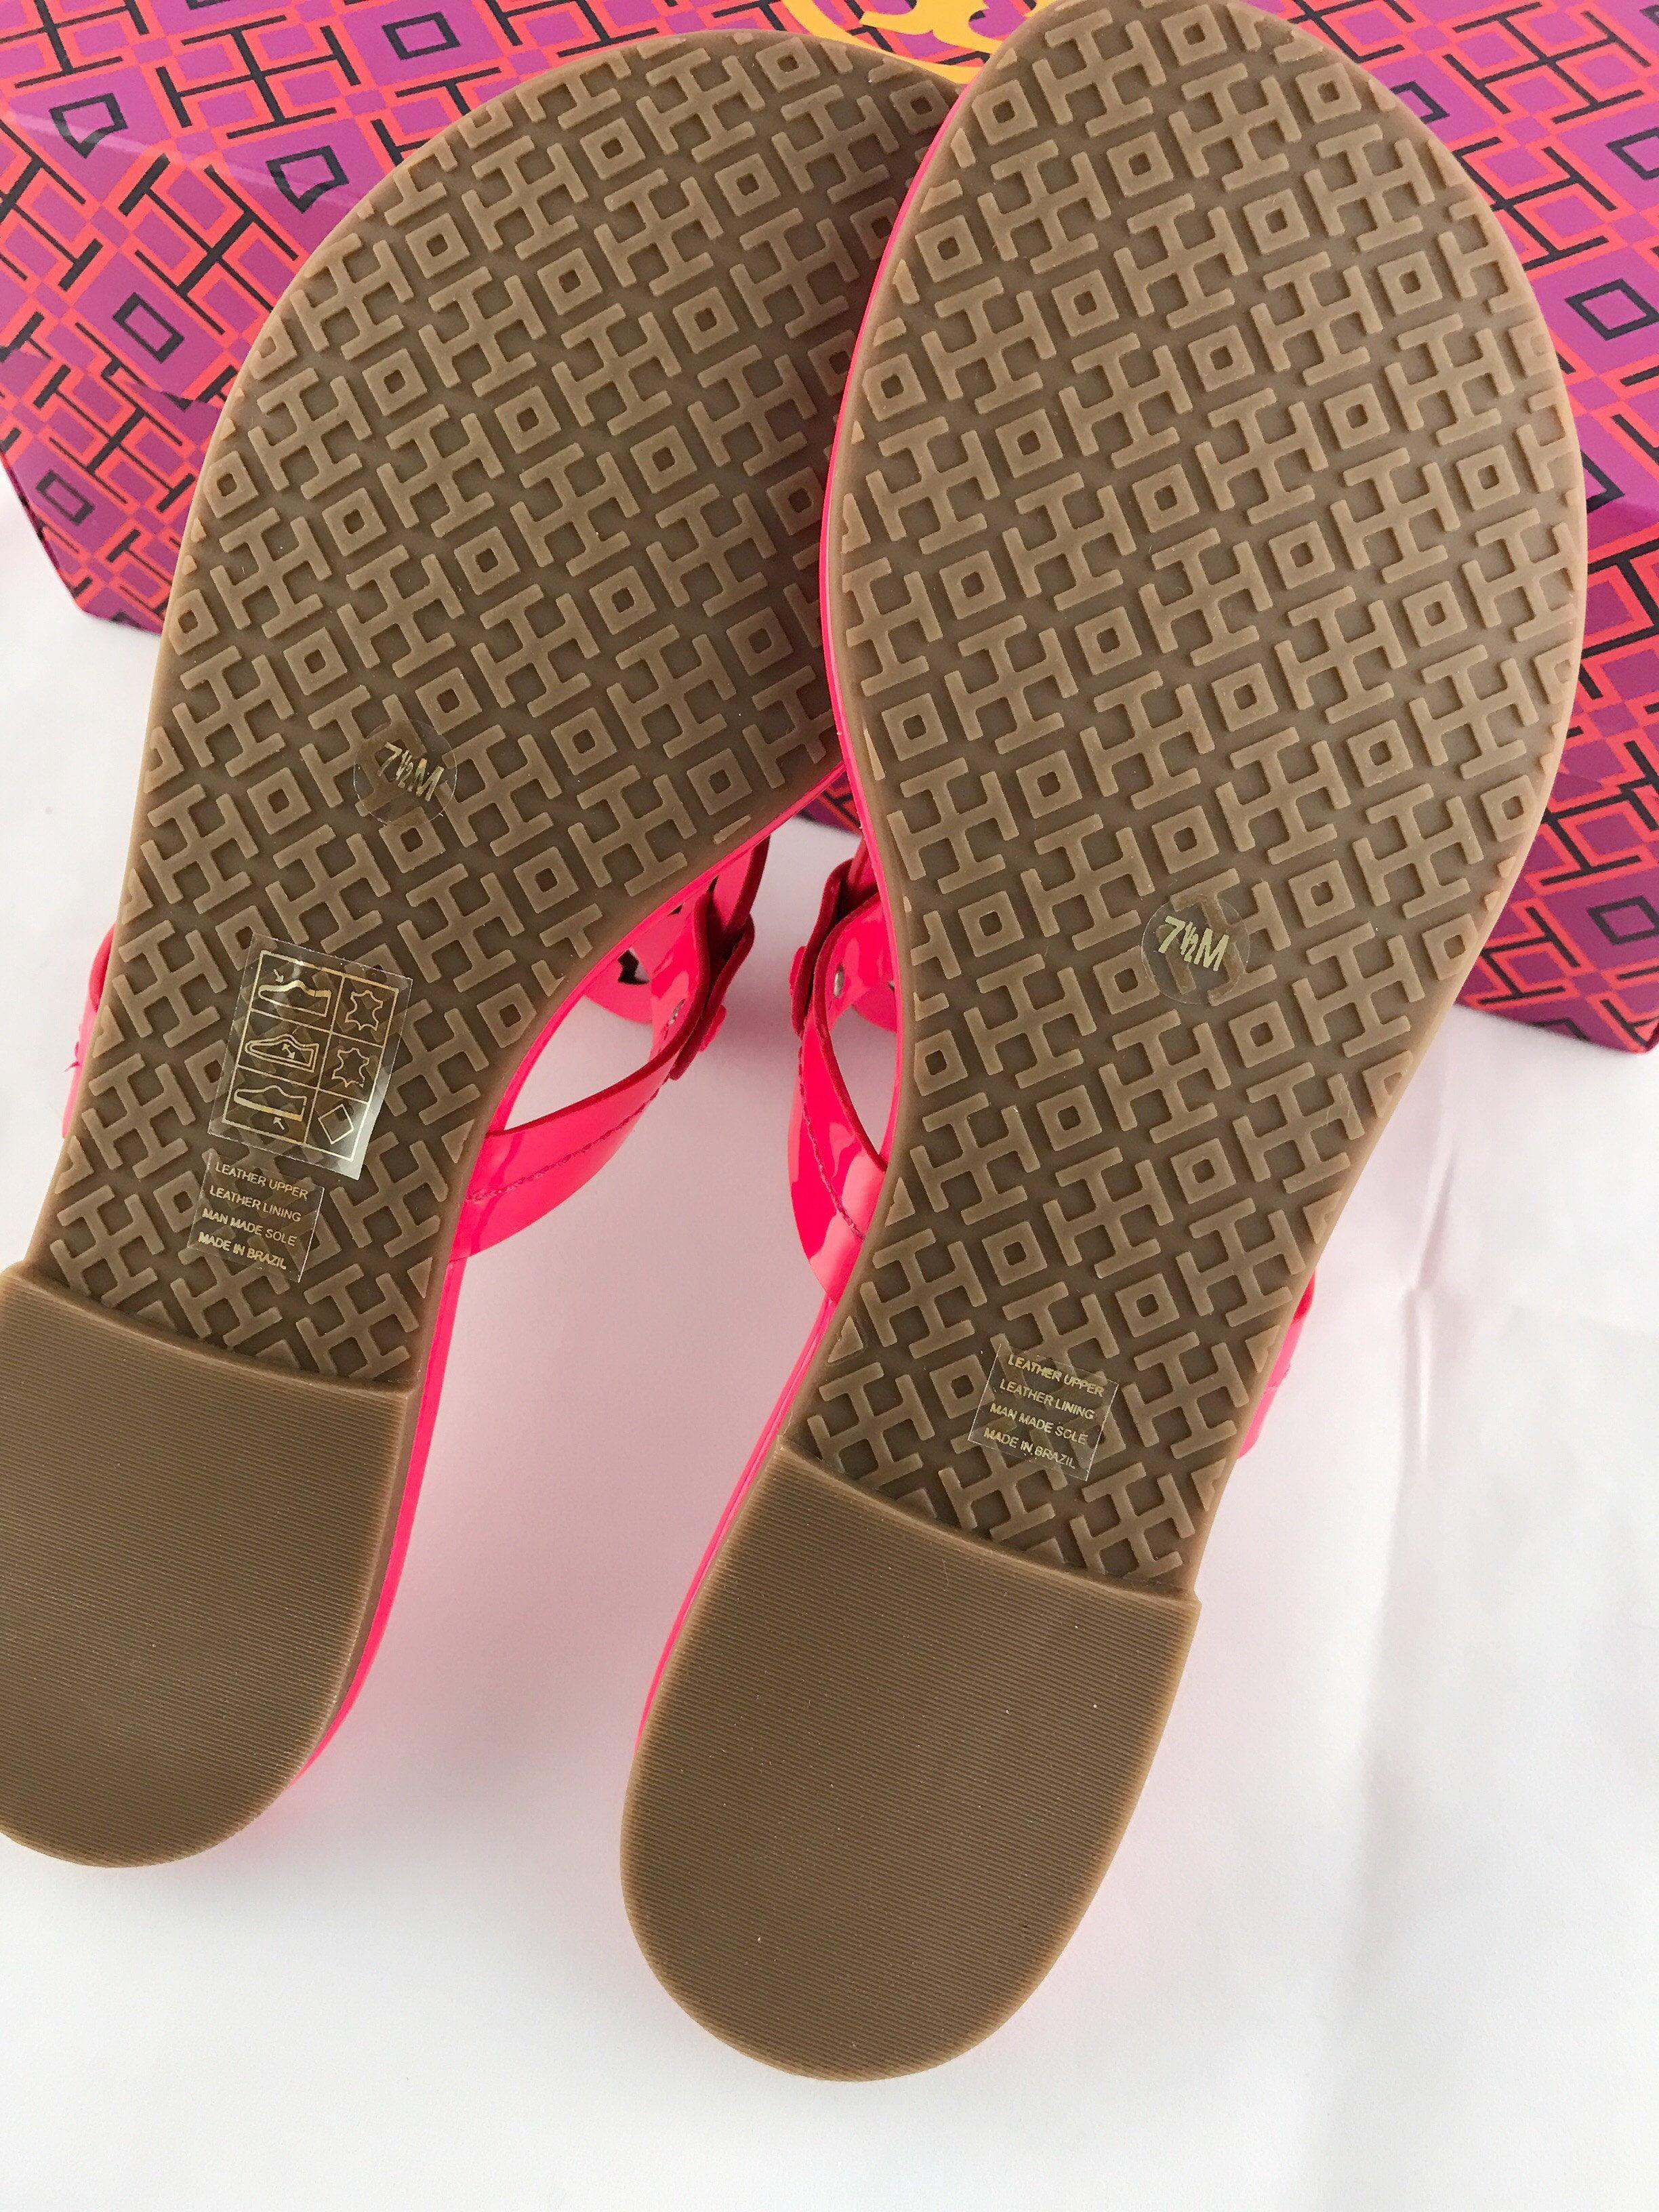 0fcc45a5137b9e Tory Burch - Tory Burch Miller Sandals Thong Flip Flop Patent Leather Neon  Pink 7.5 Fuchsia - Walmart.com